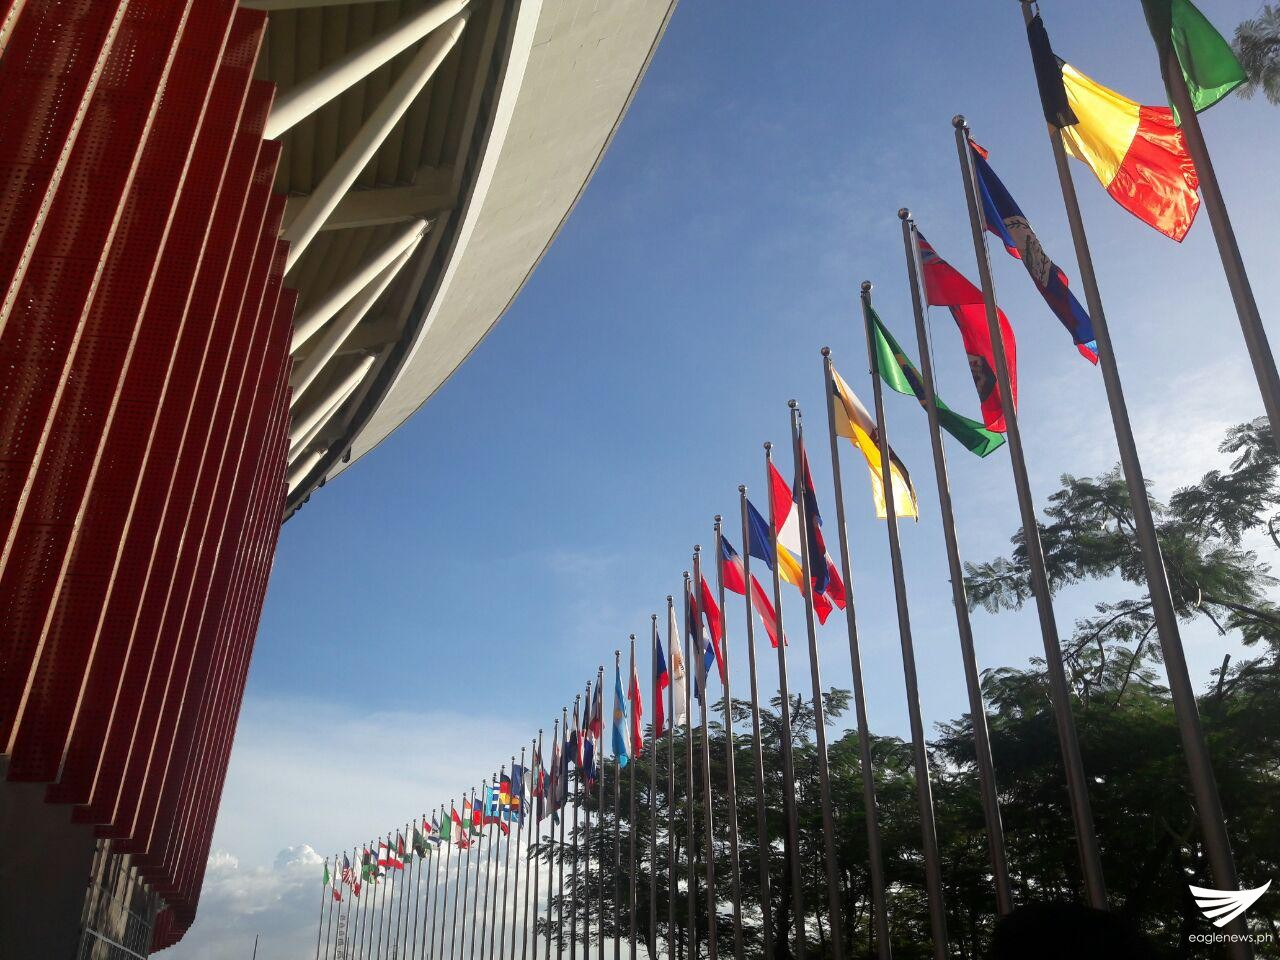 philippine-arena00003